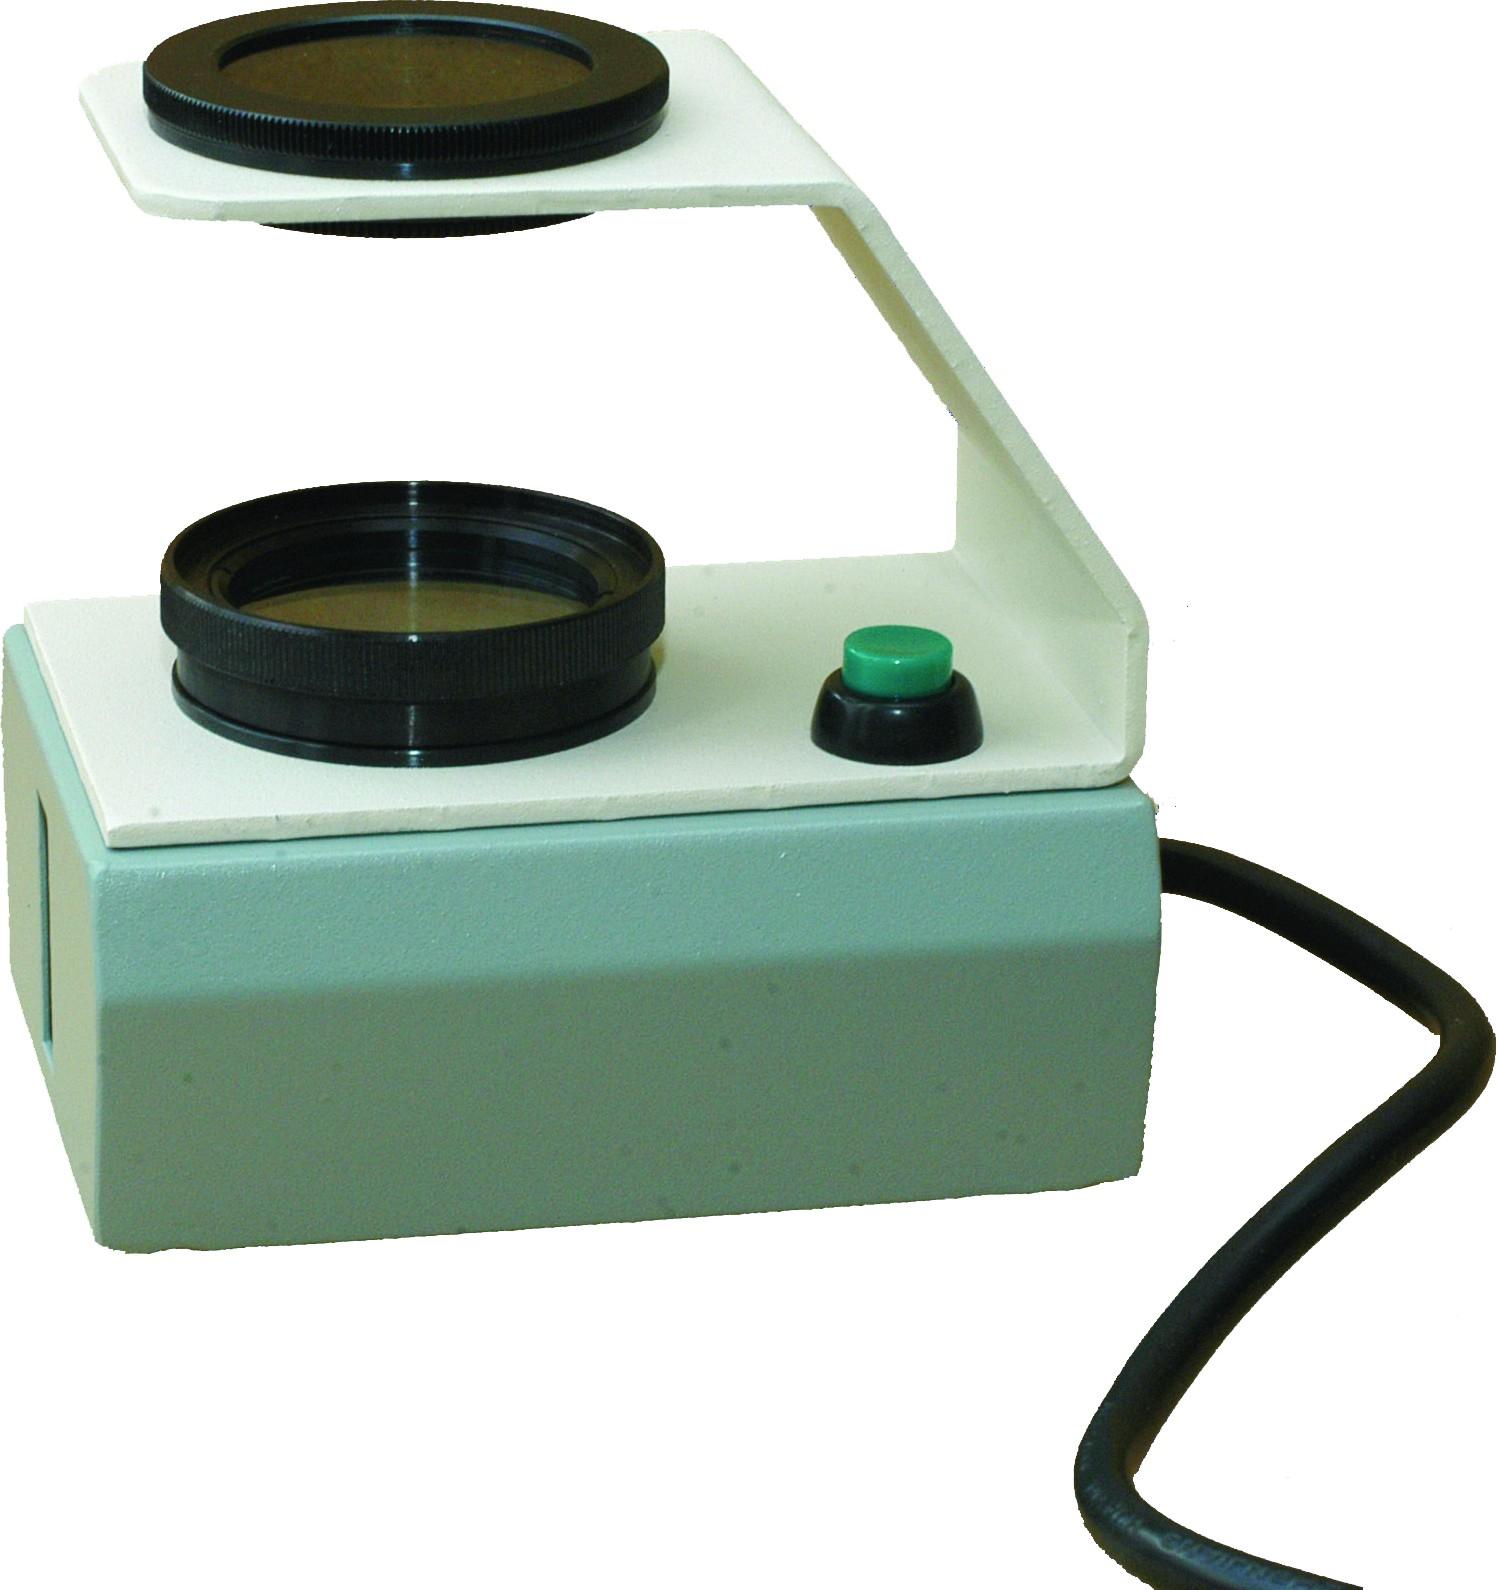 Gemological Instruments